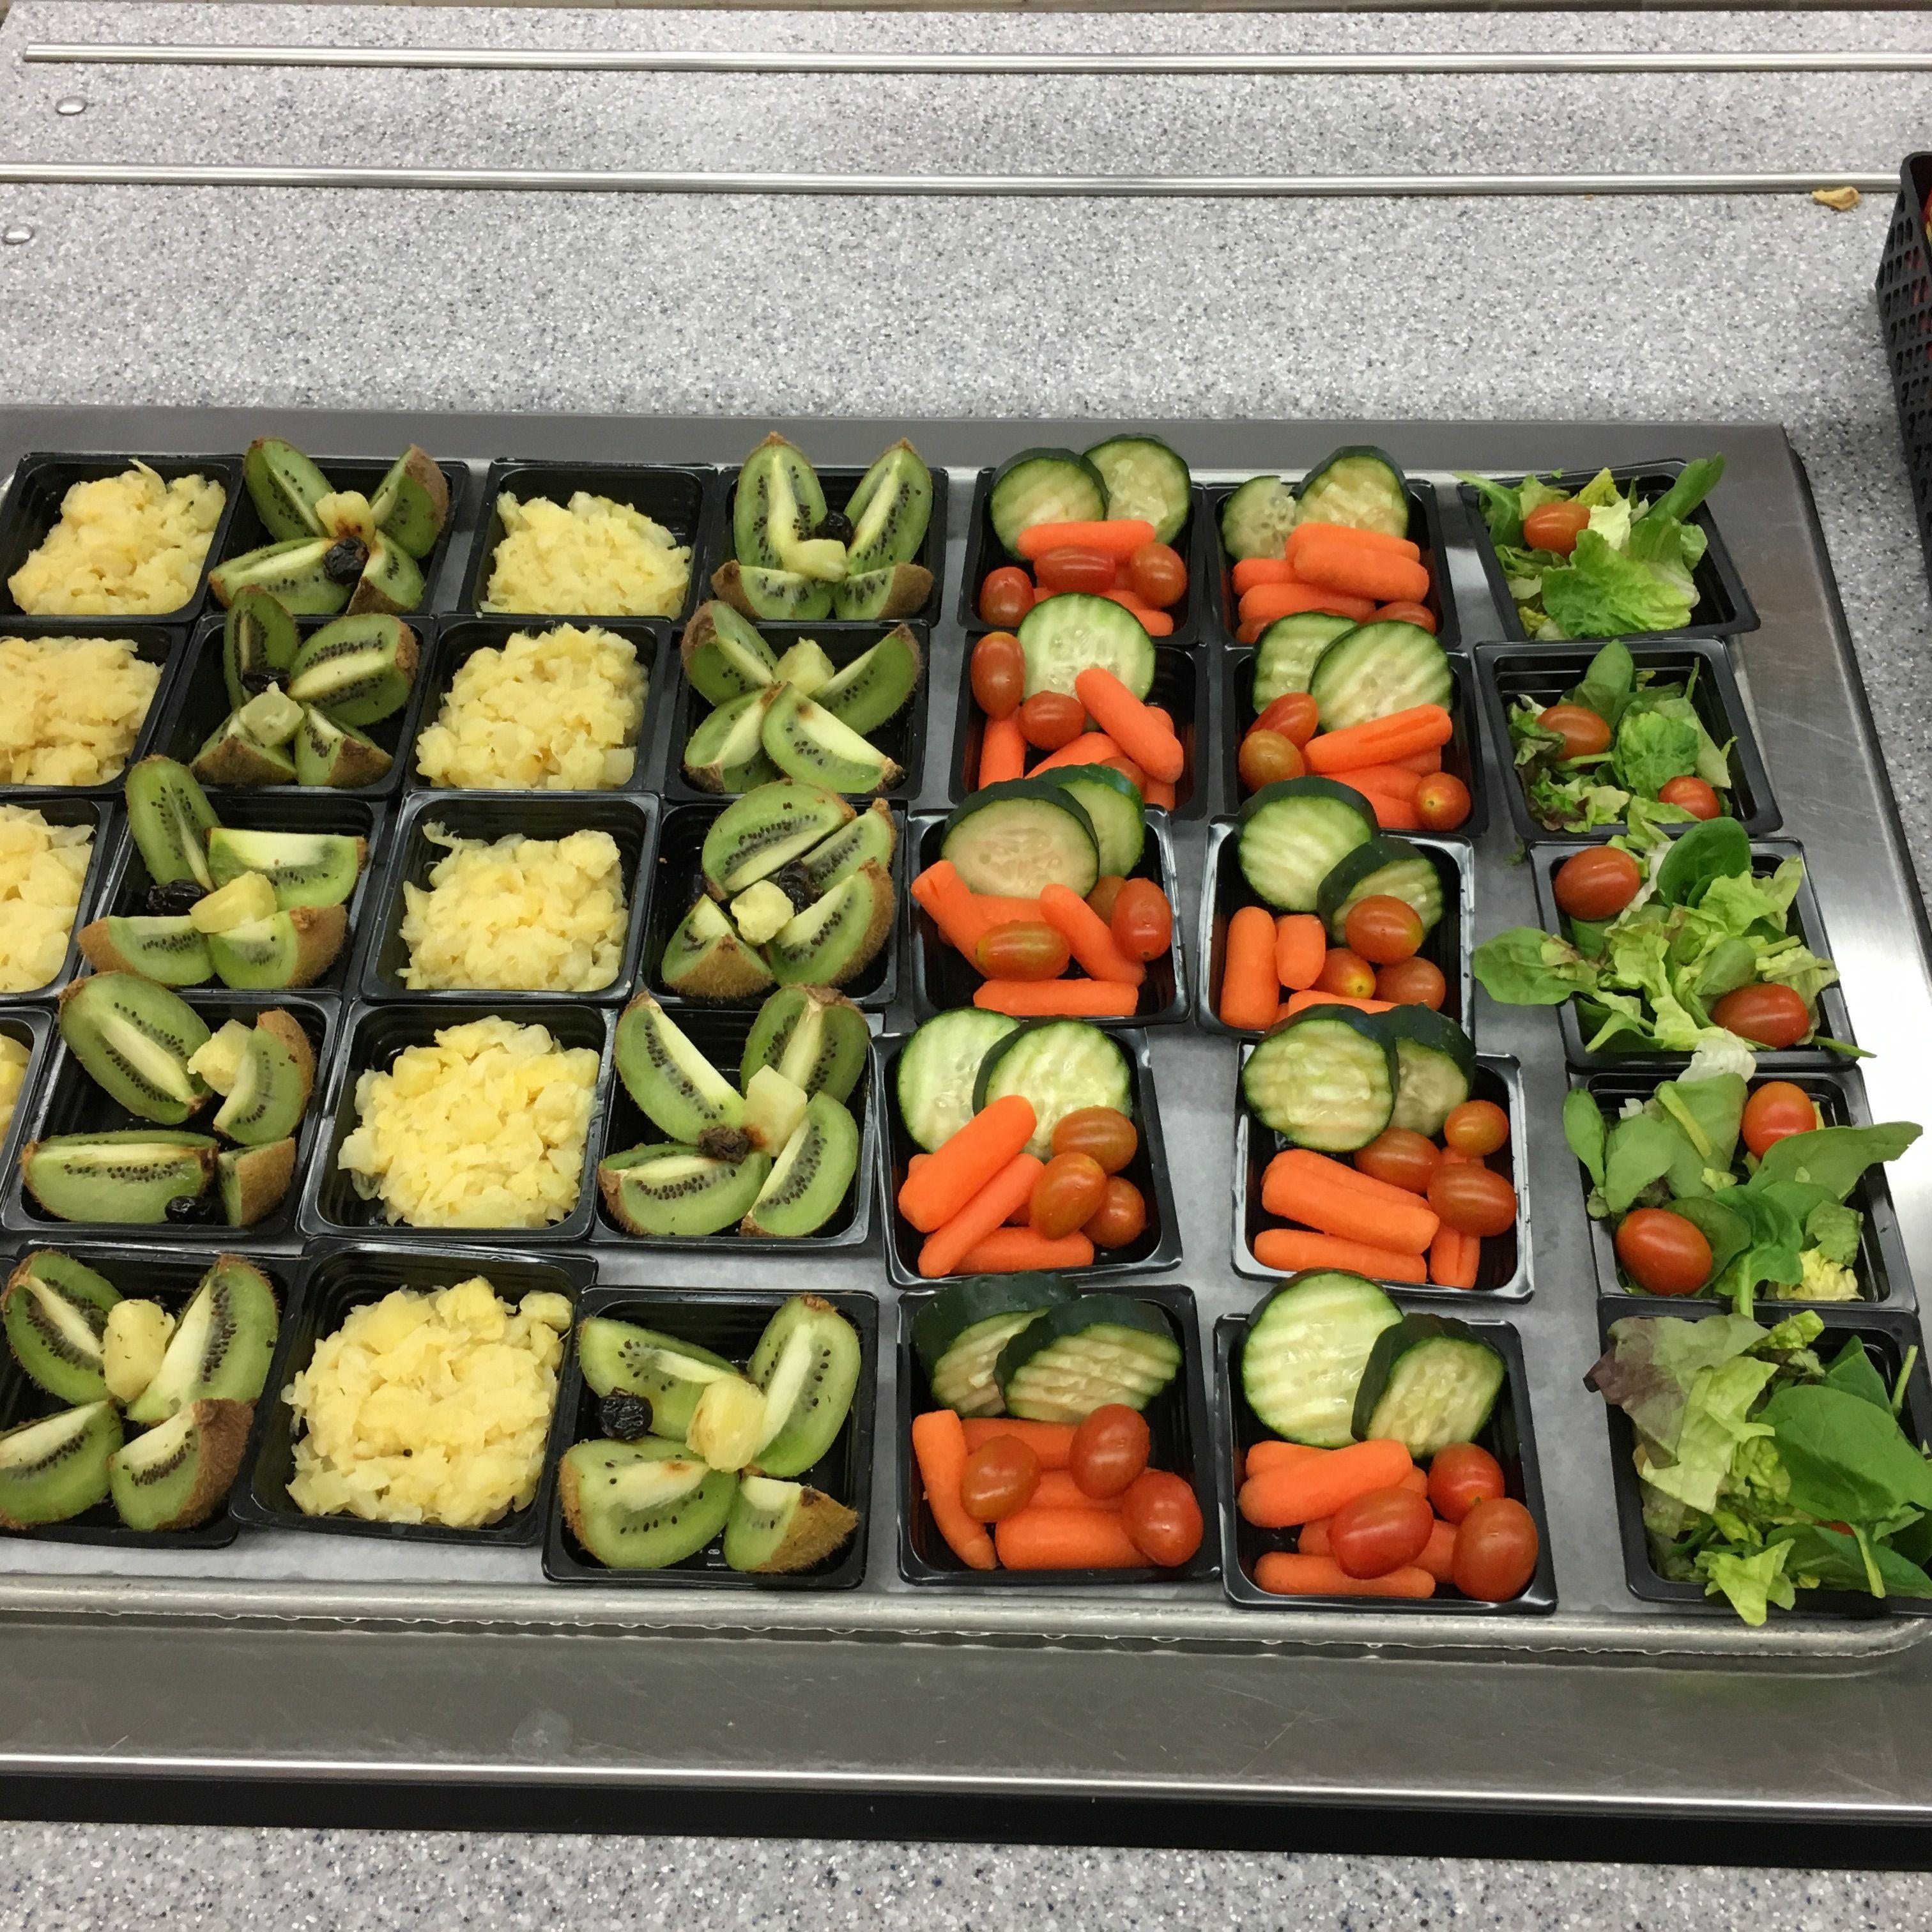 Fruit and veggies at ridge meadows elementary school